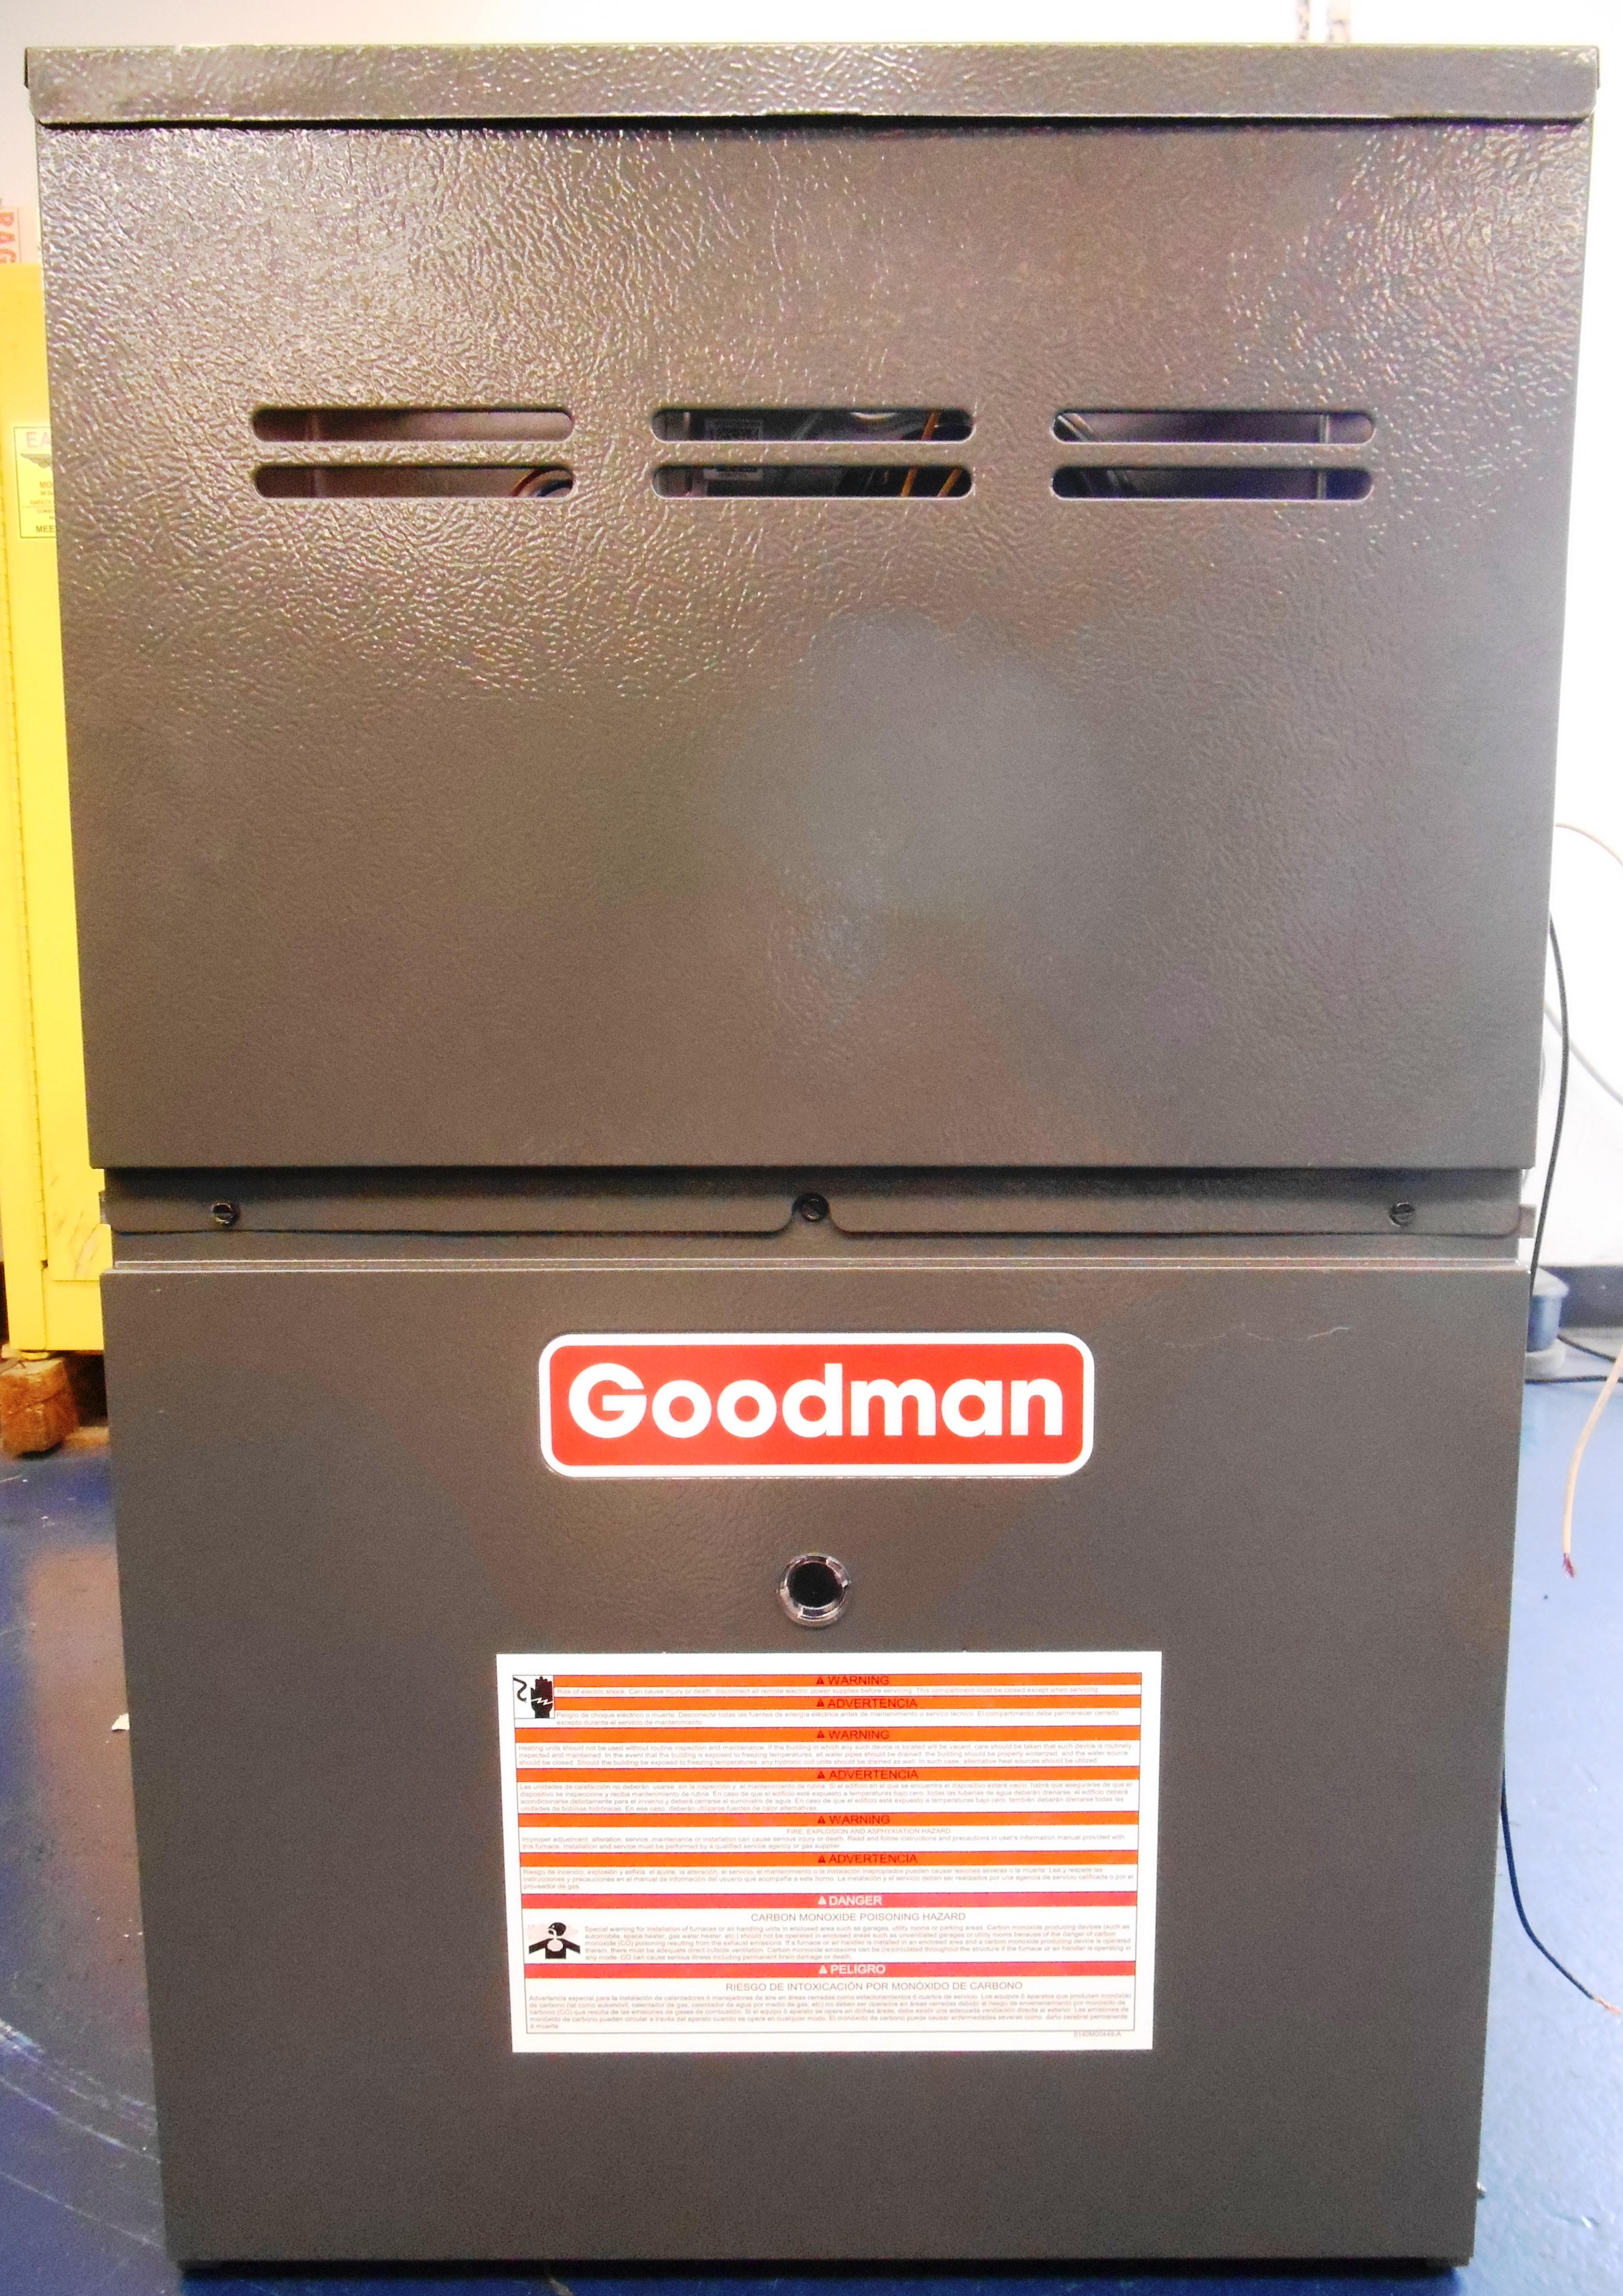 Goodman Condenser Wiring Diagram - Roslonek.net